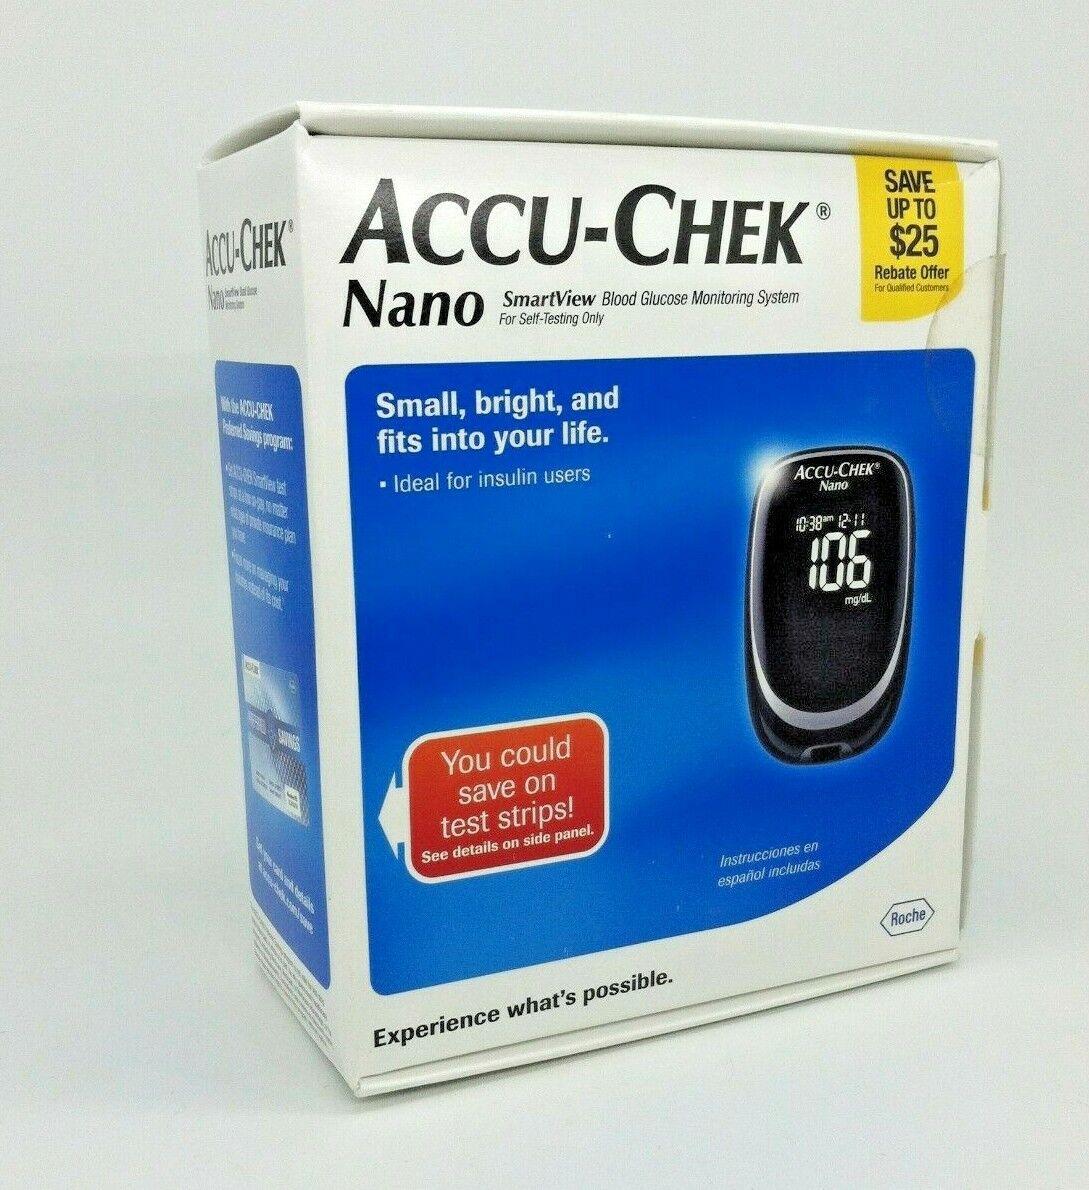 ACCU-CHEK Nano SmartView Blood Glucose Monitoring System 1 E